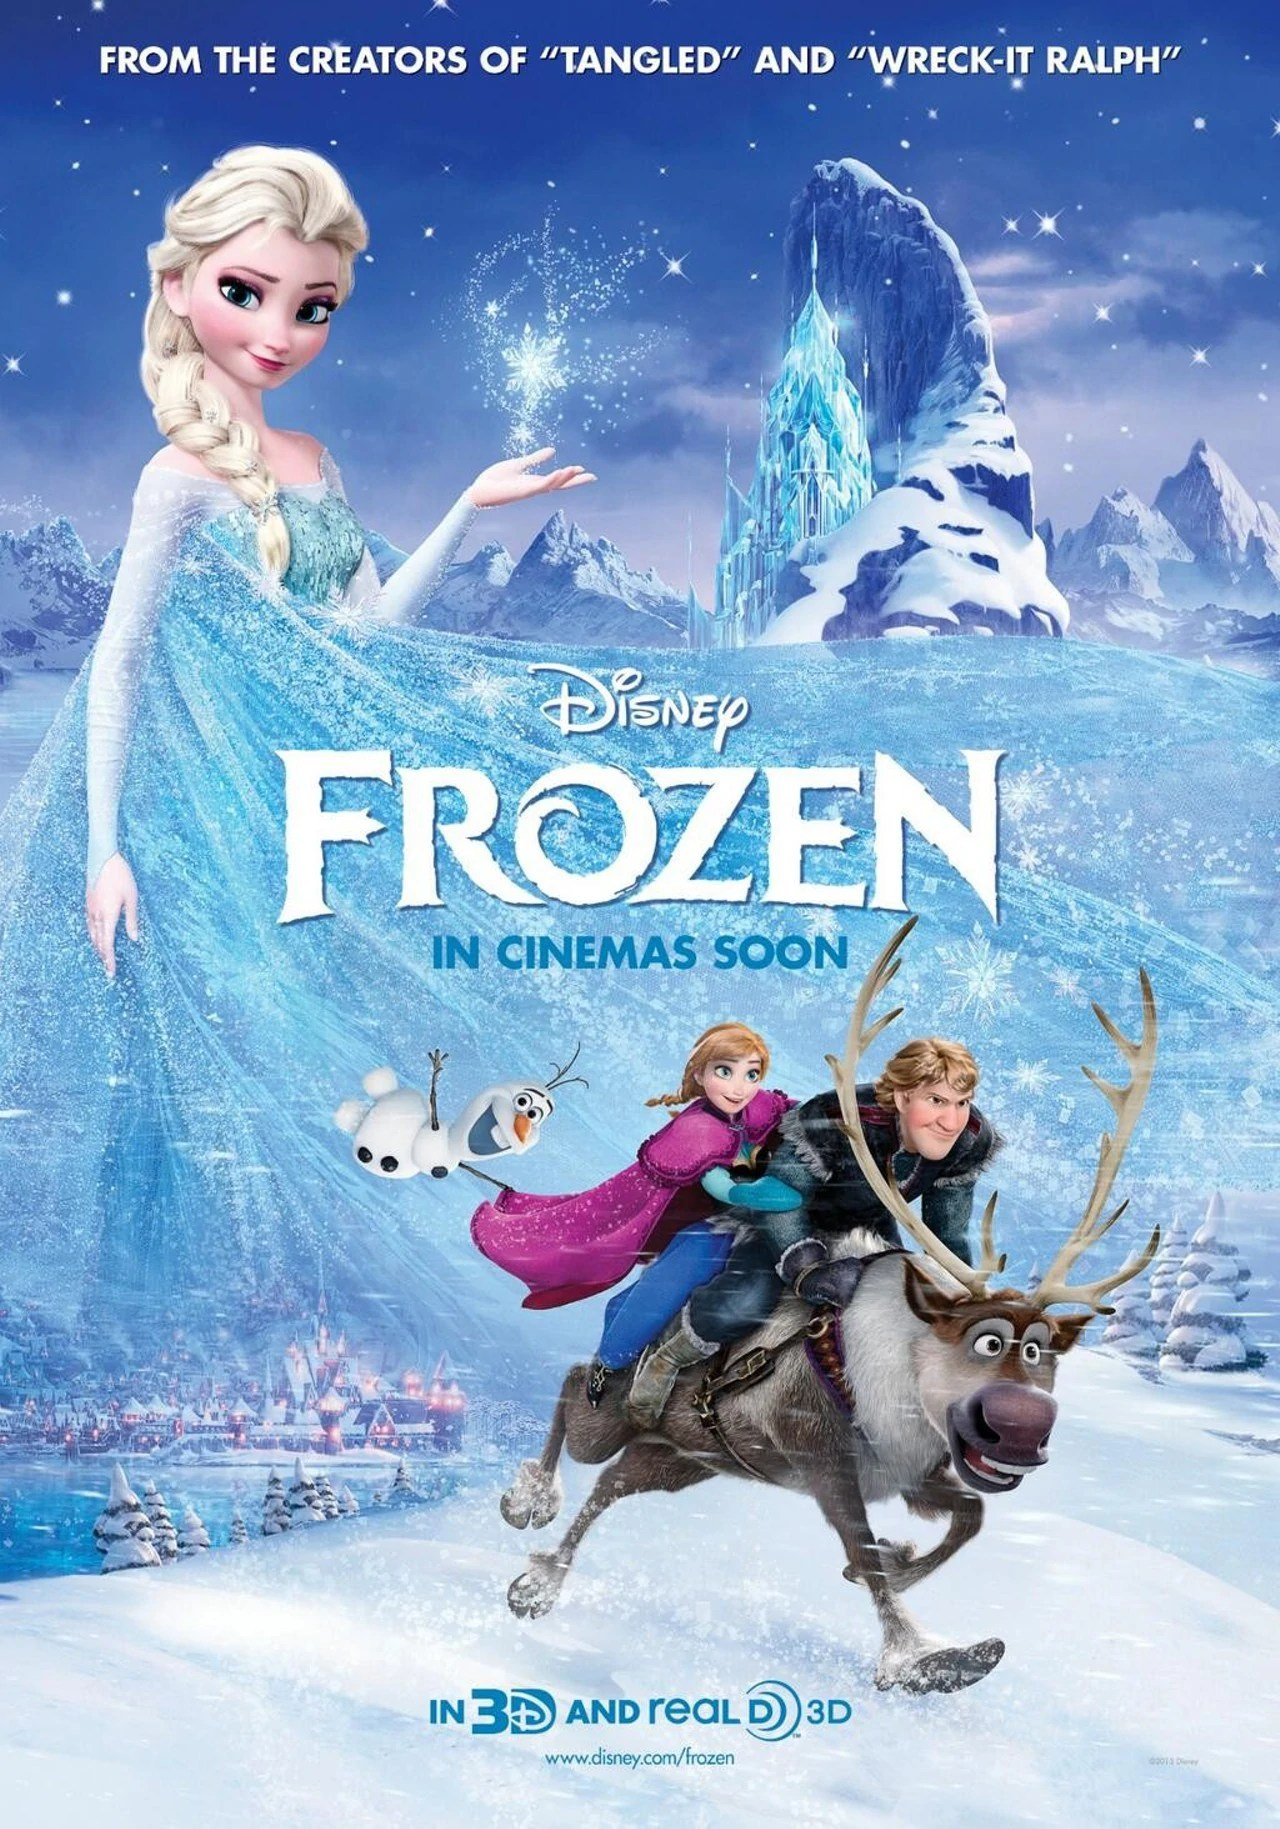 http://disney.wikia.com/wiki/Frozen